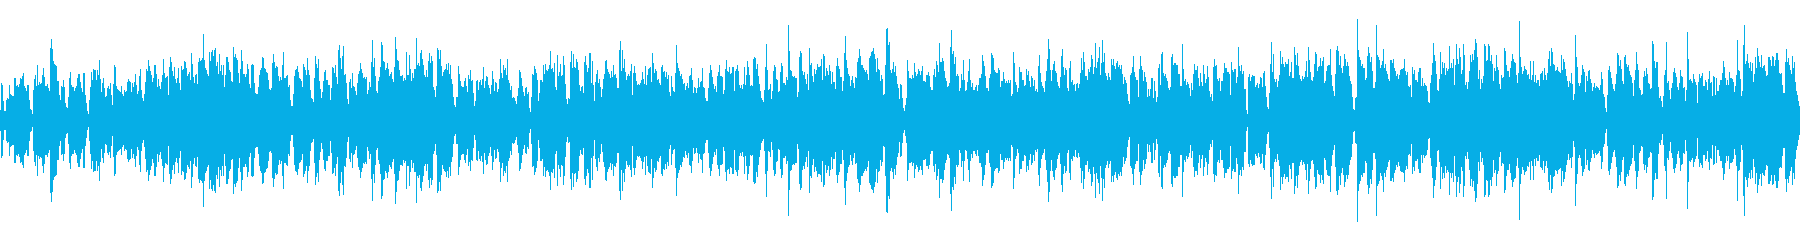 Nu-Jazzです。1分9秒、ループ可の再生済みの波形